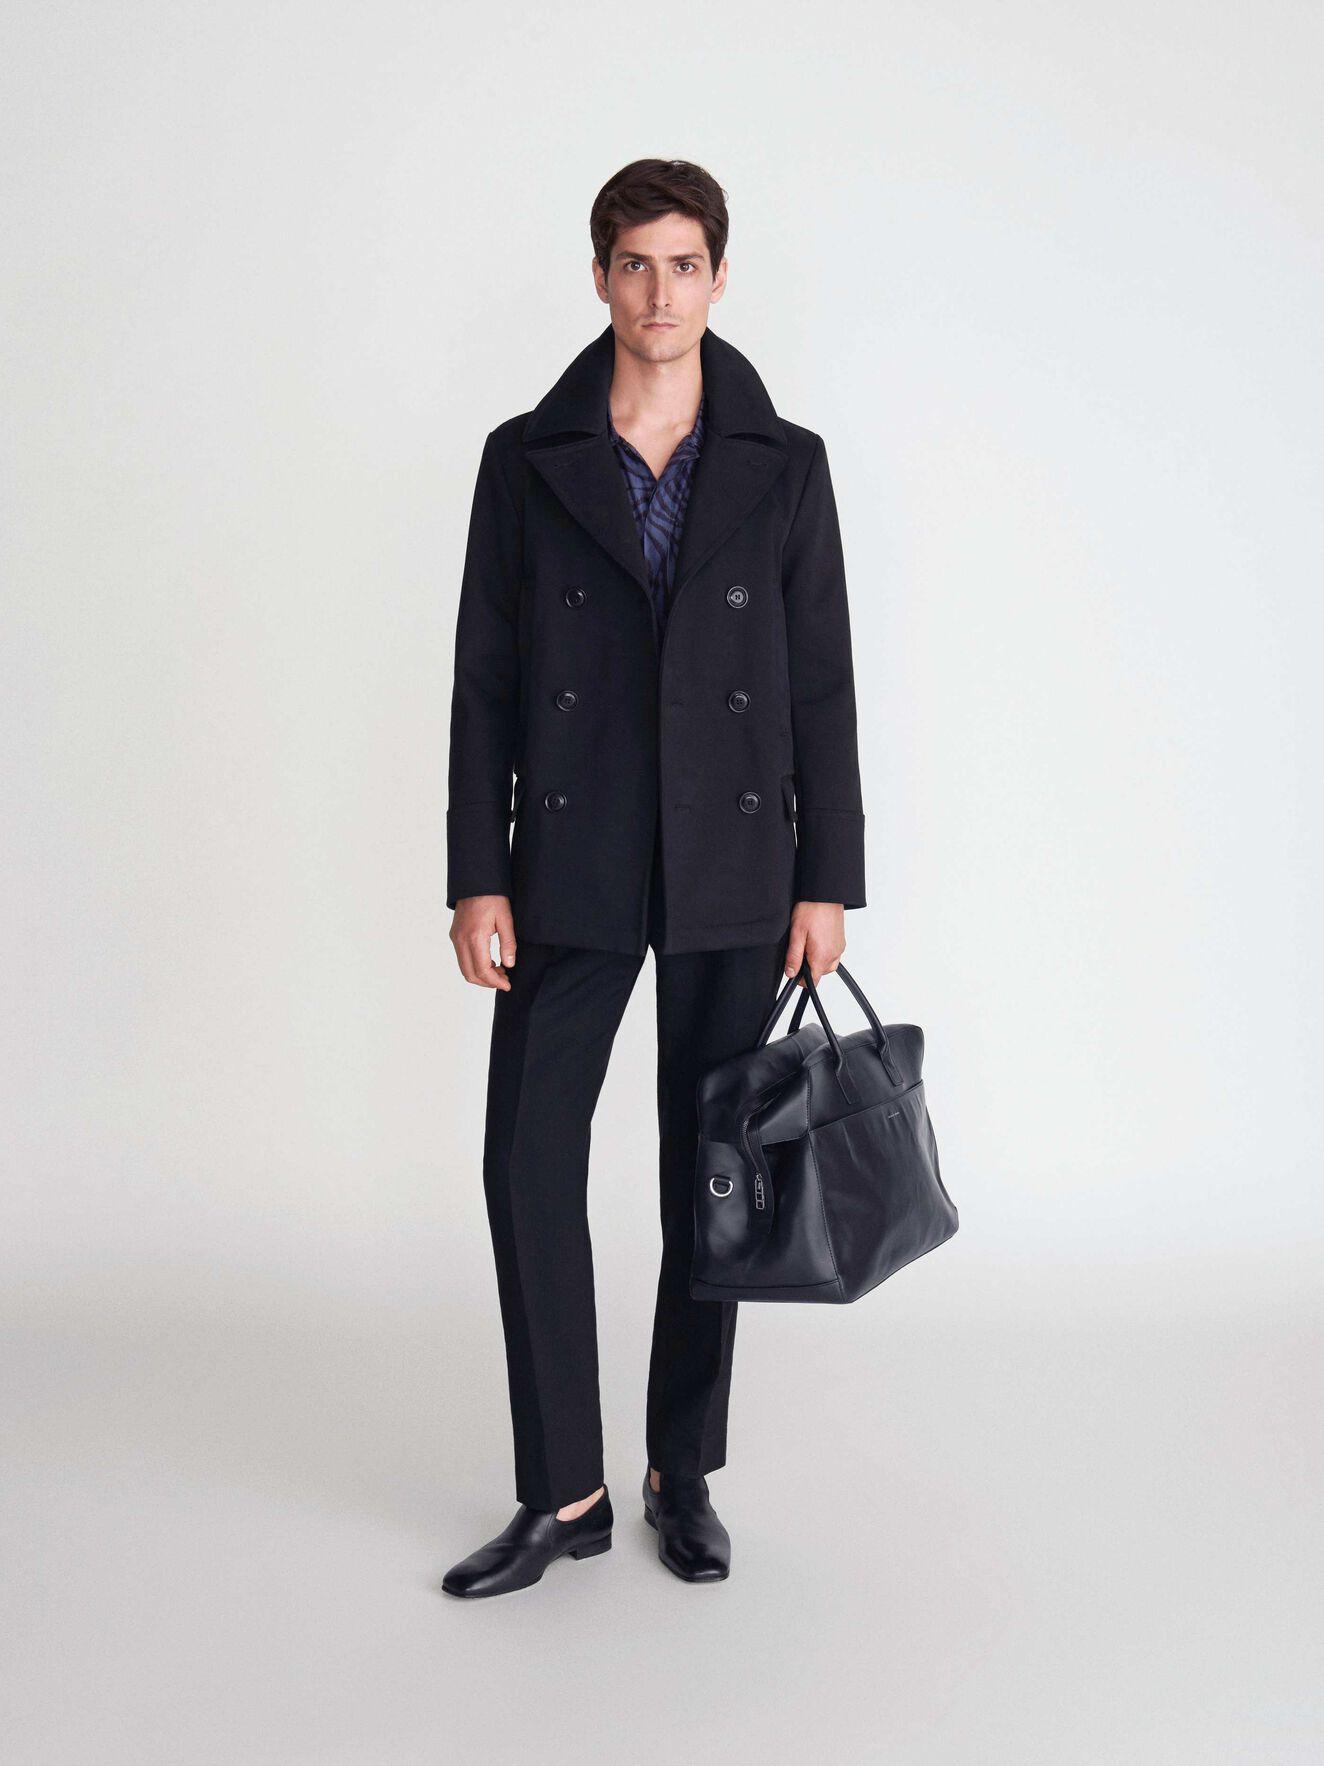 Solen Shoes in Black from Tiger of Sweden